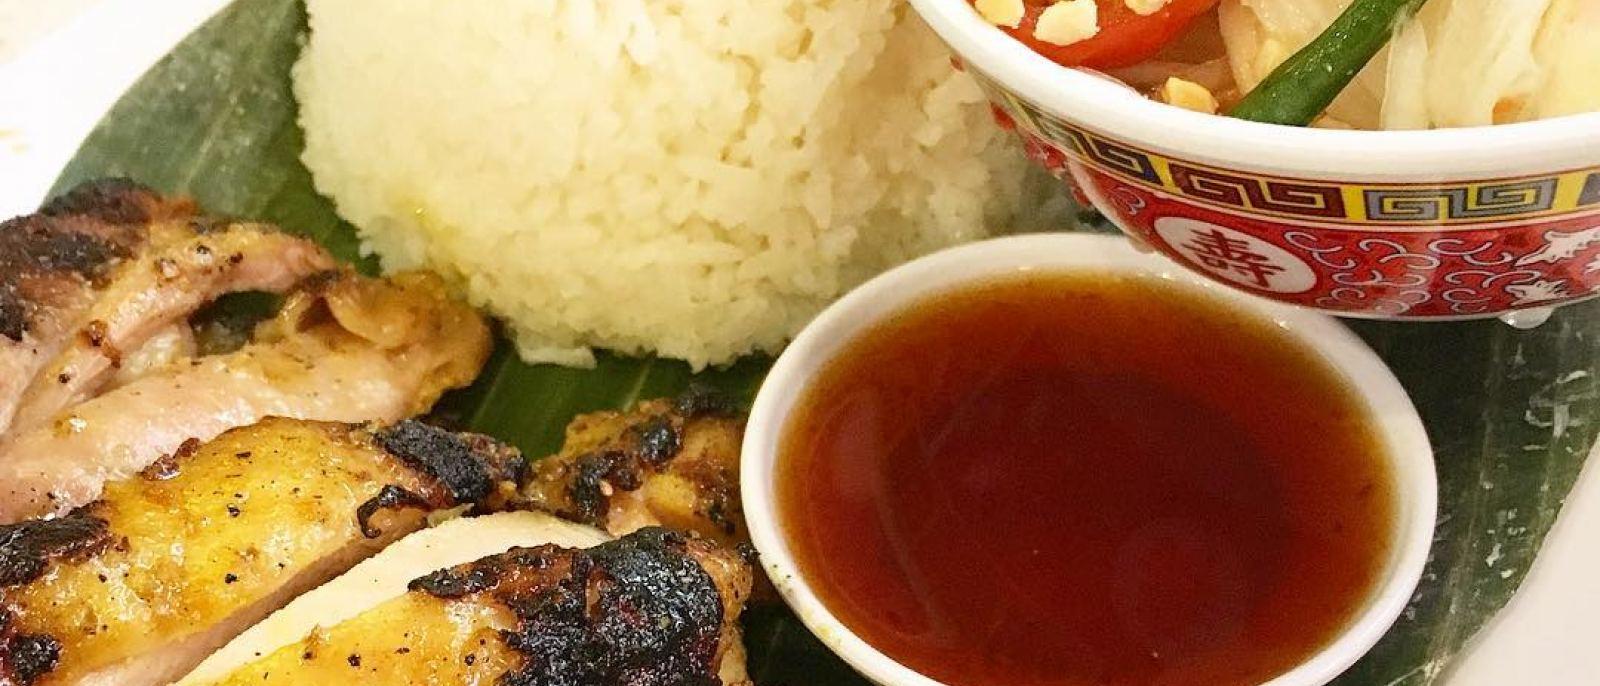 Sticky Rice GCM Gai Yang